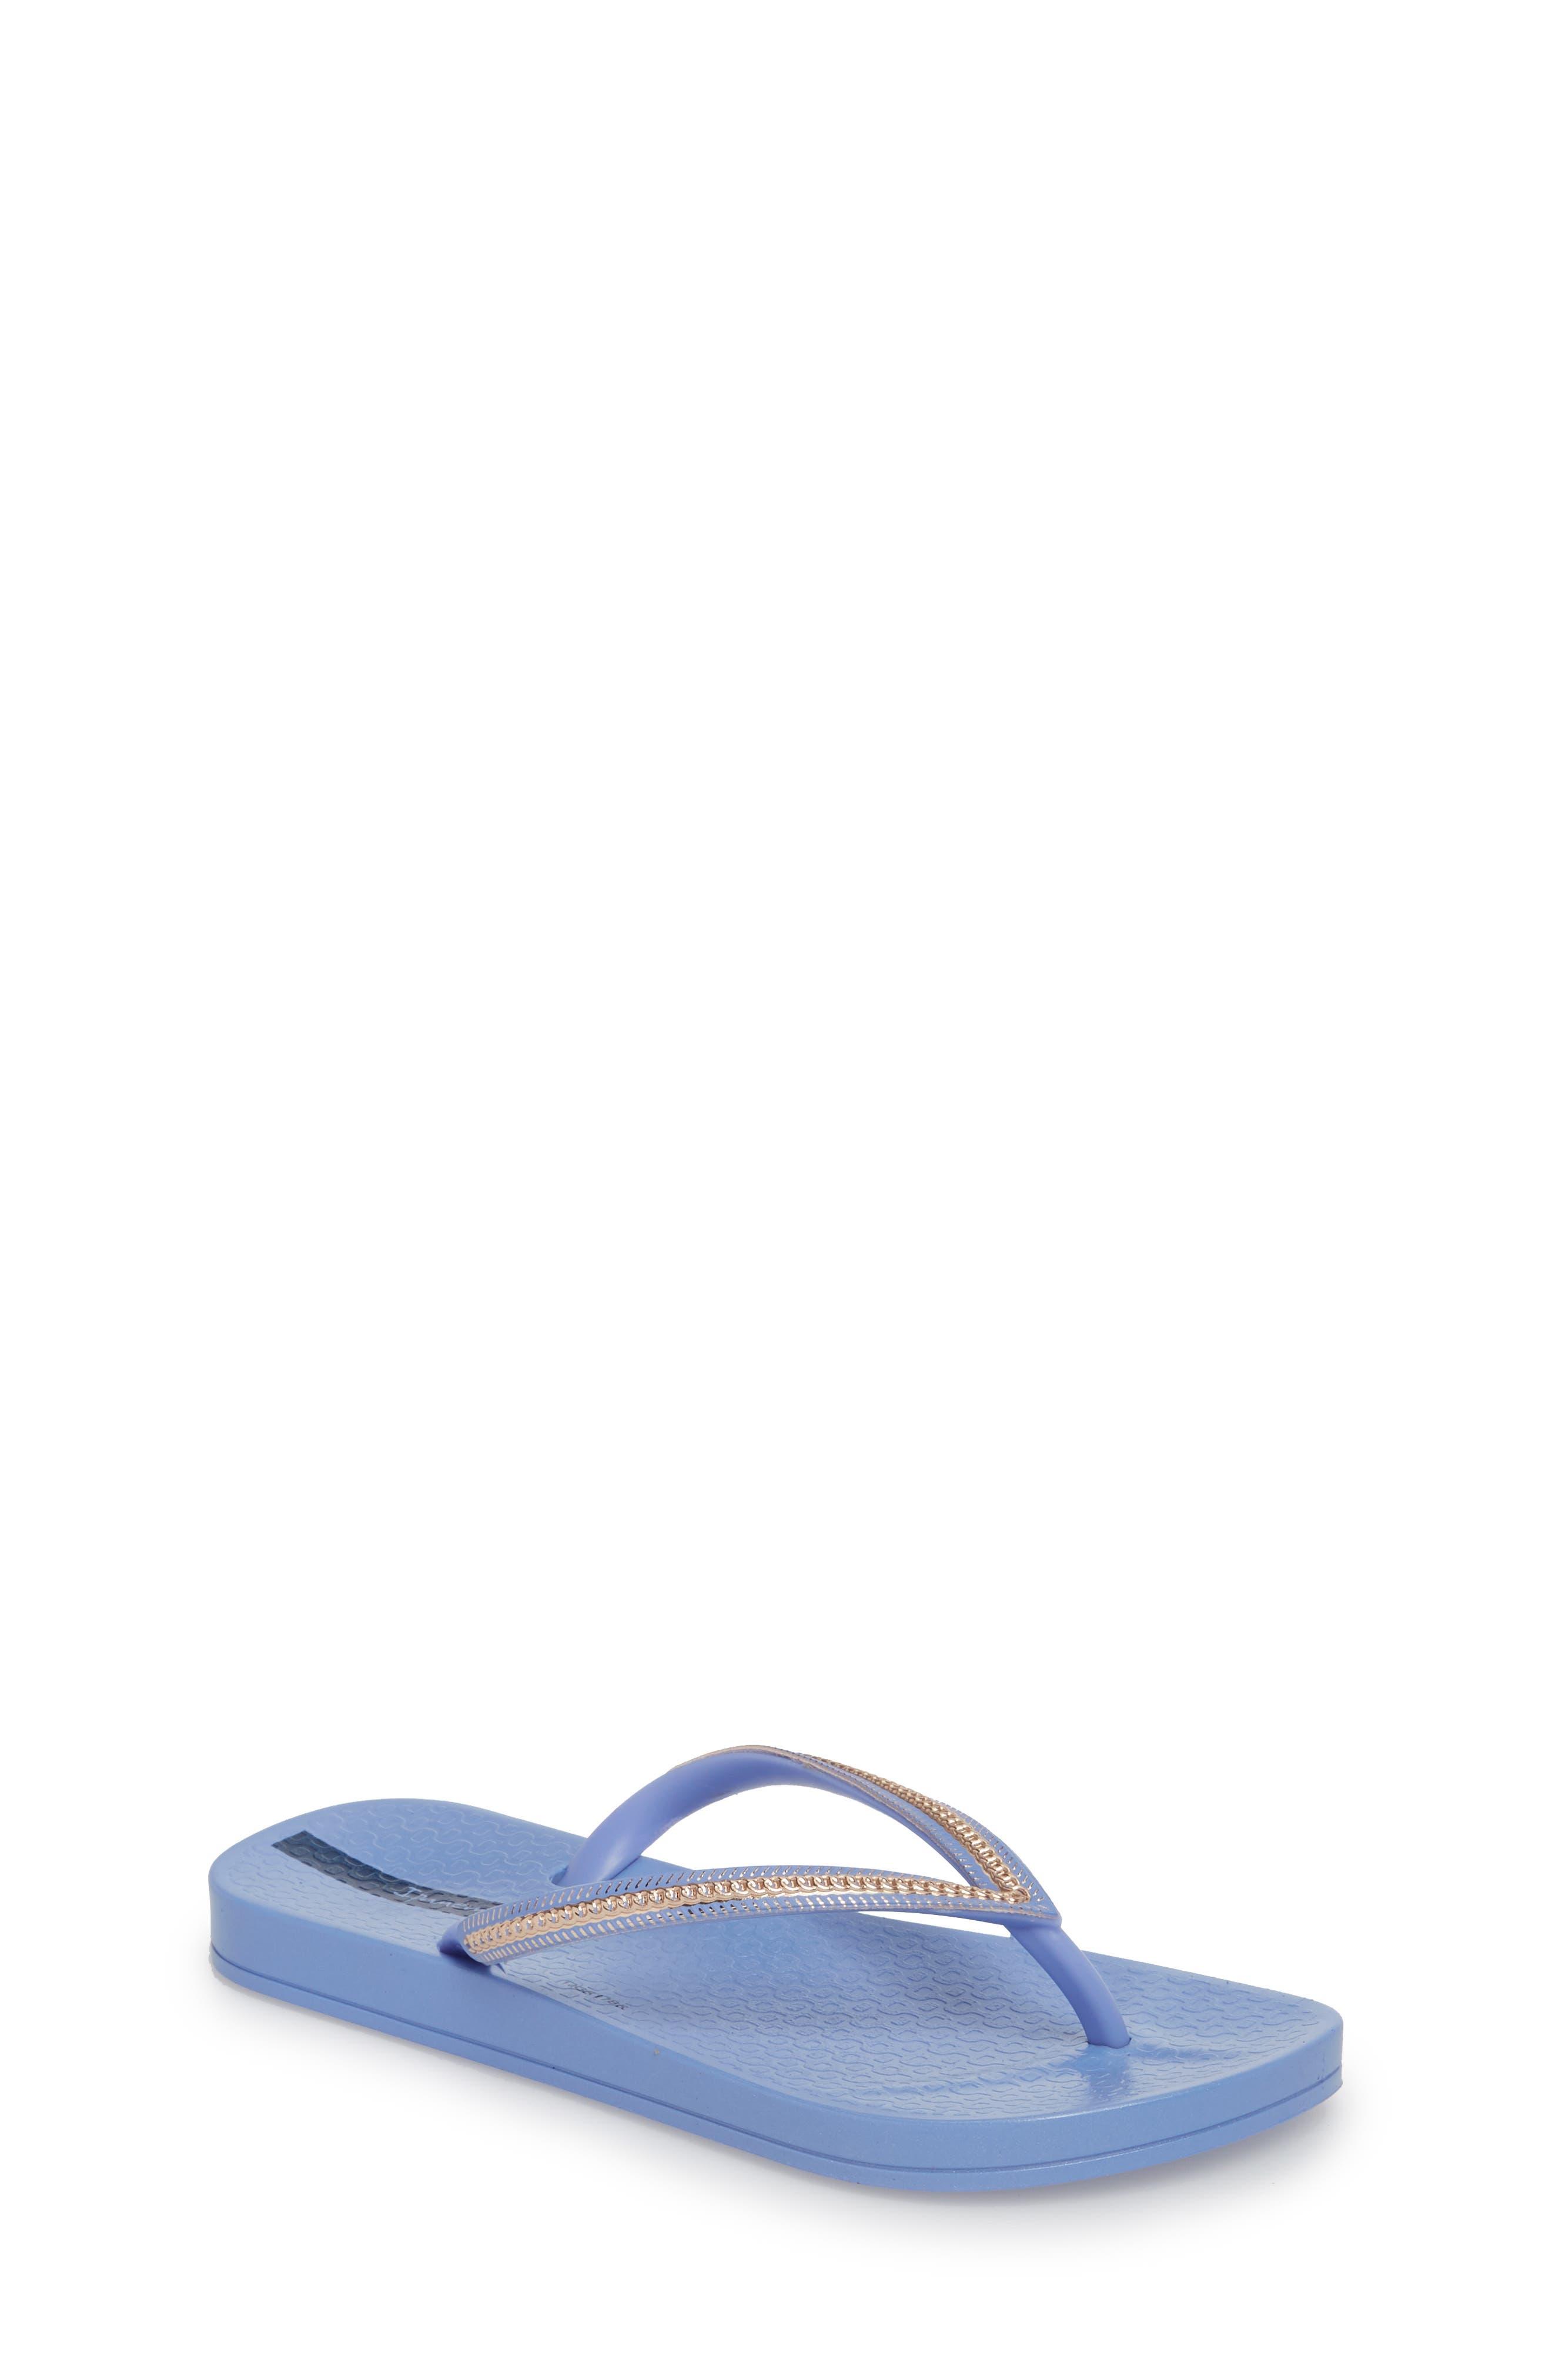 Ana Metallic Flip Flop,                             Main thumbnail 1, color,                             Blue/ Rose